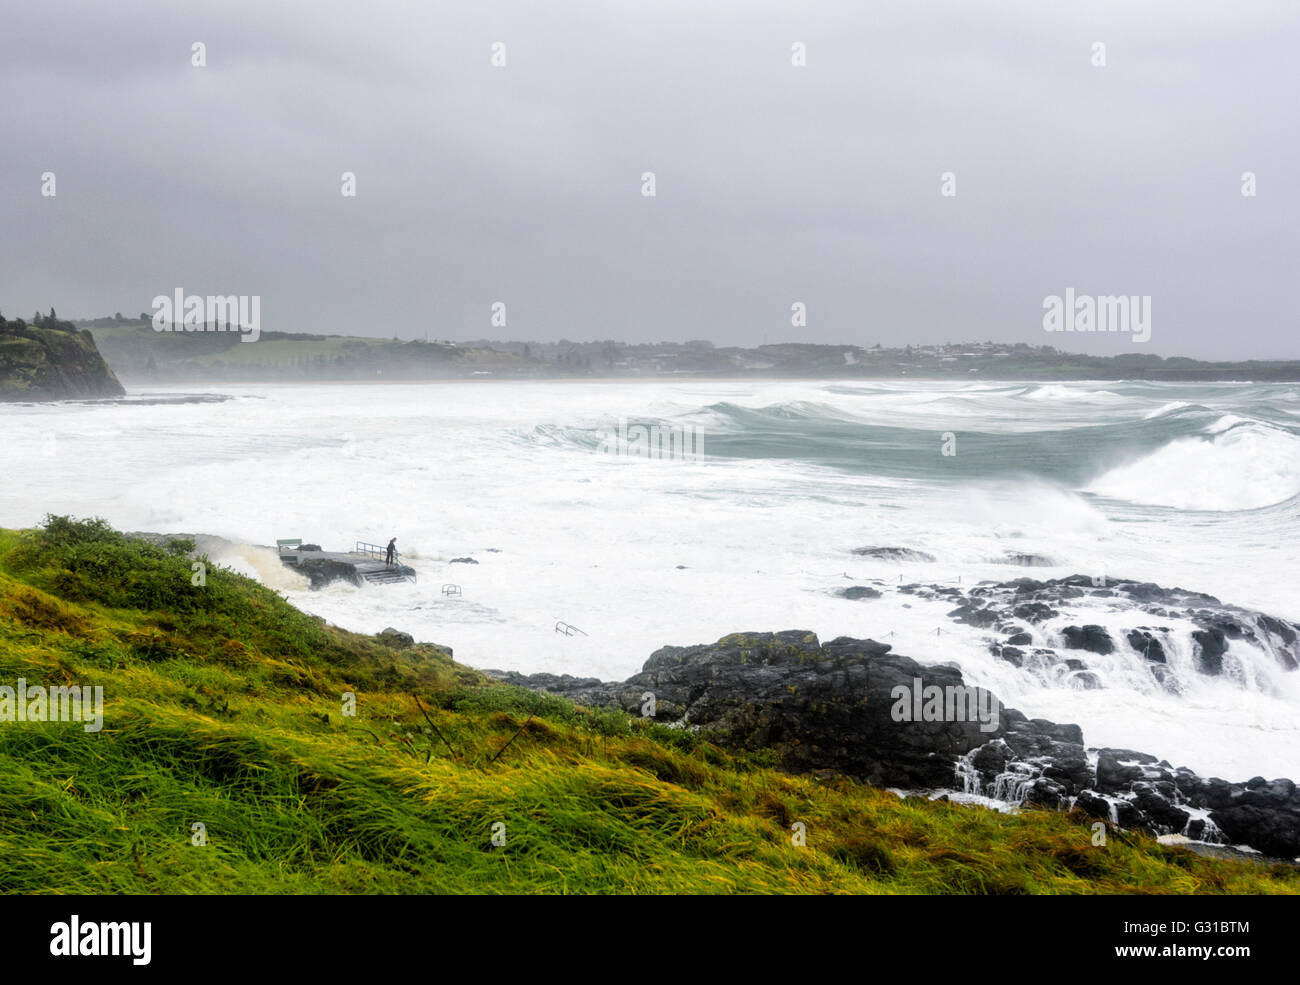 kiama-rock-pool-during-a-severe-storm-il